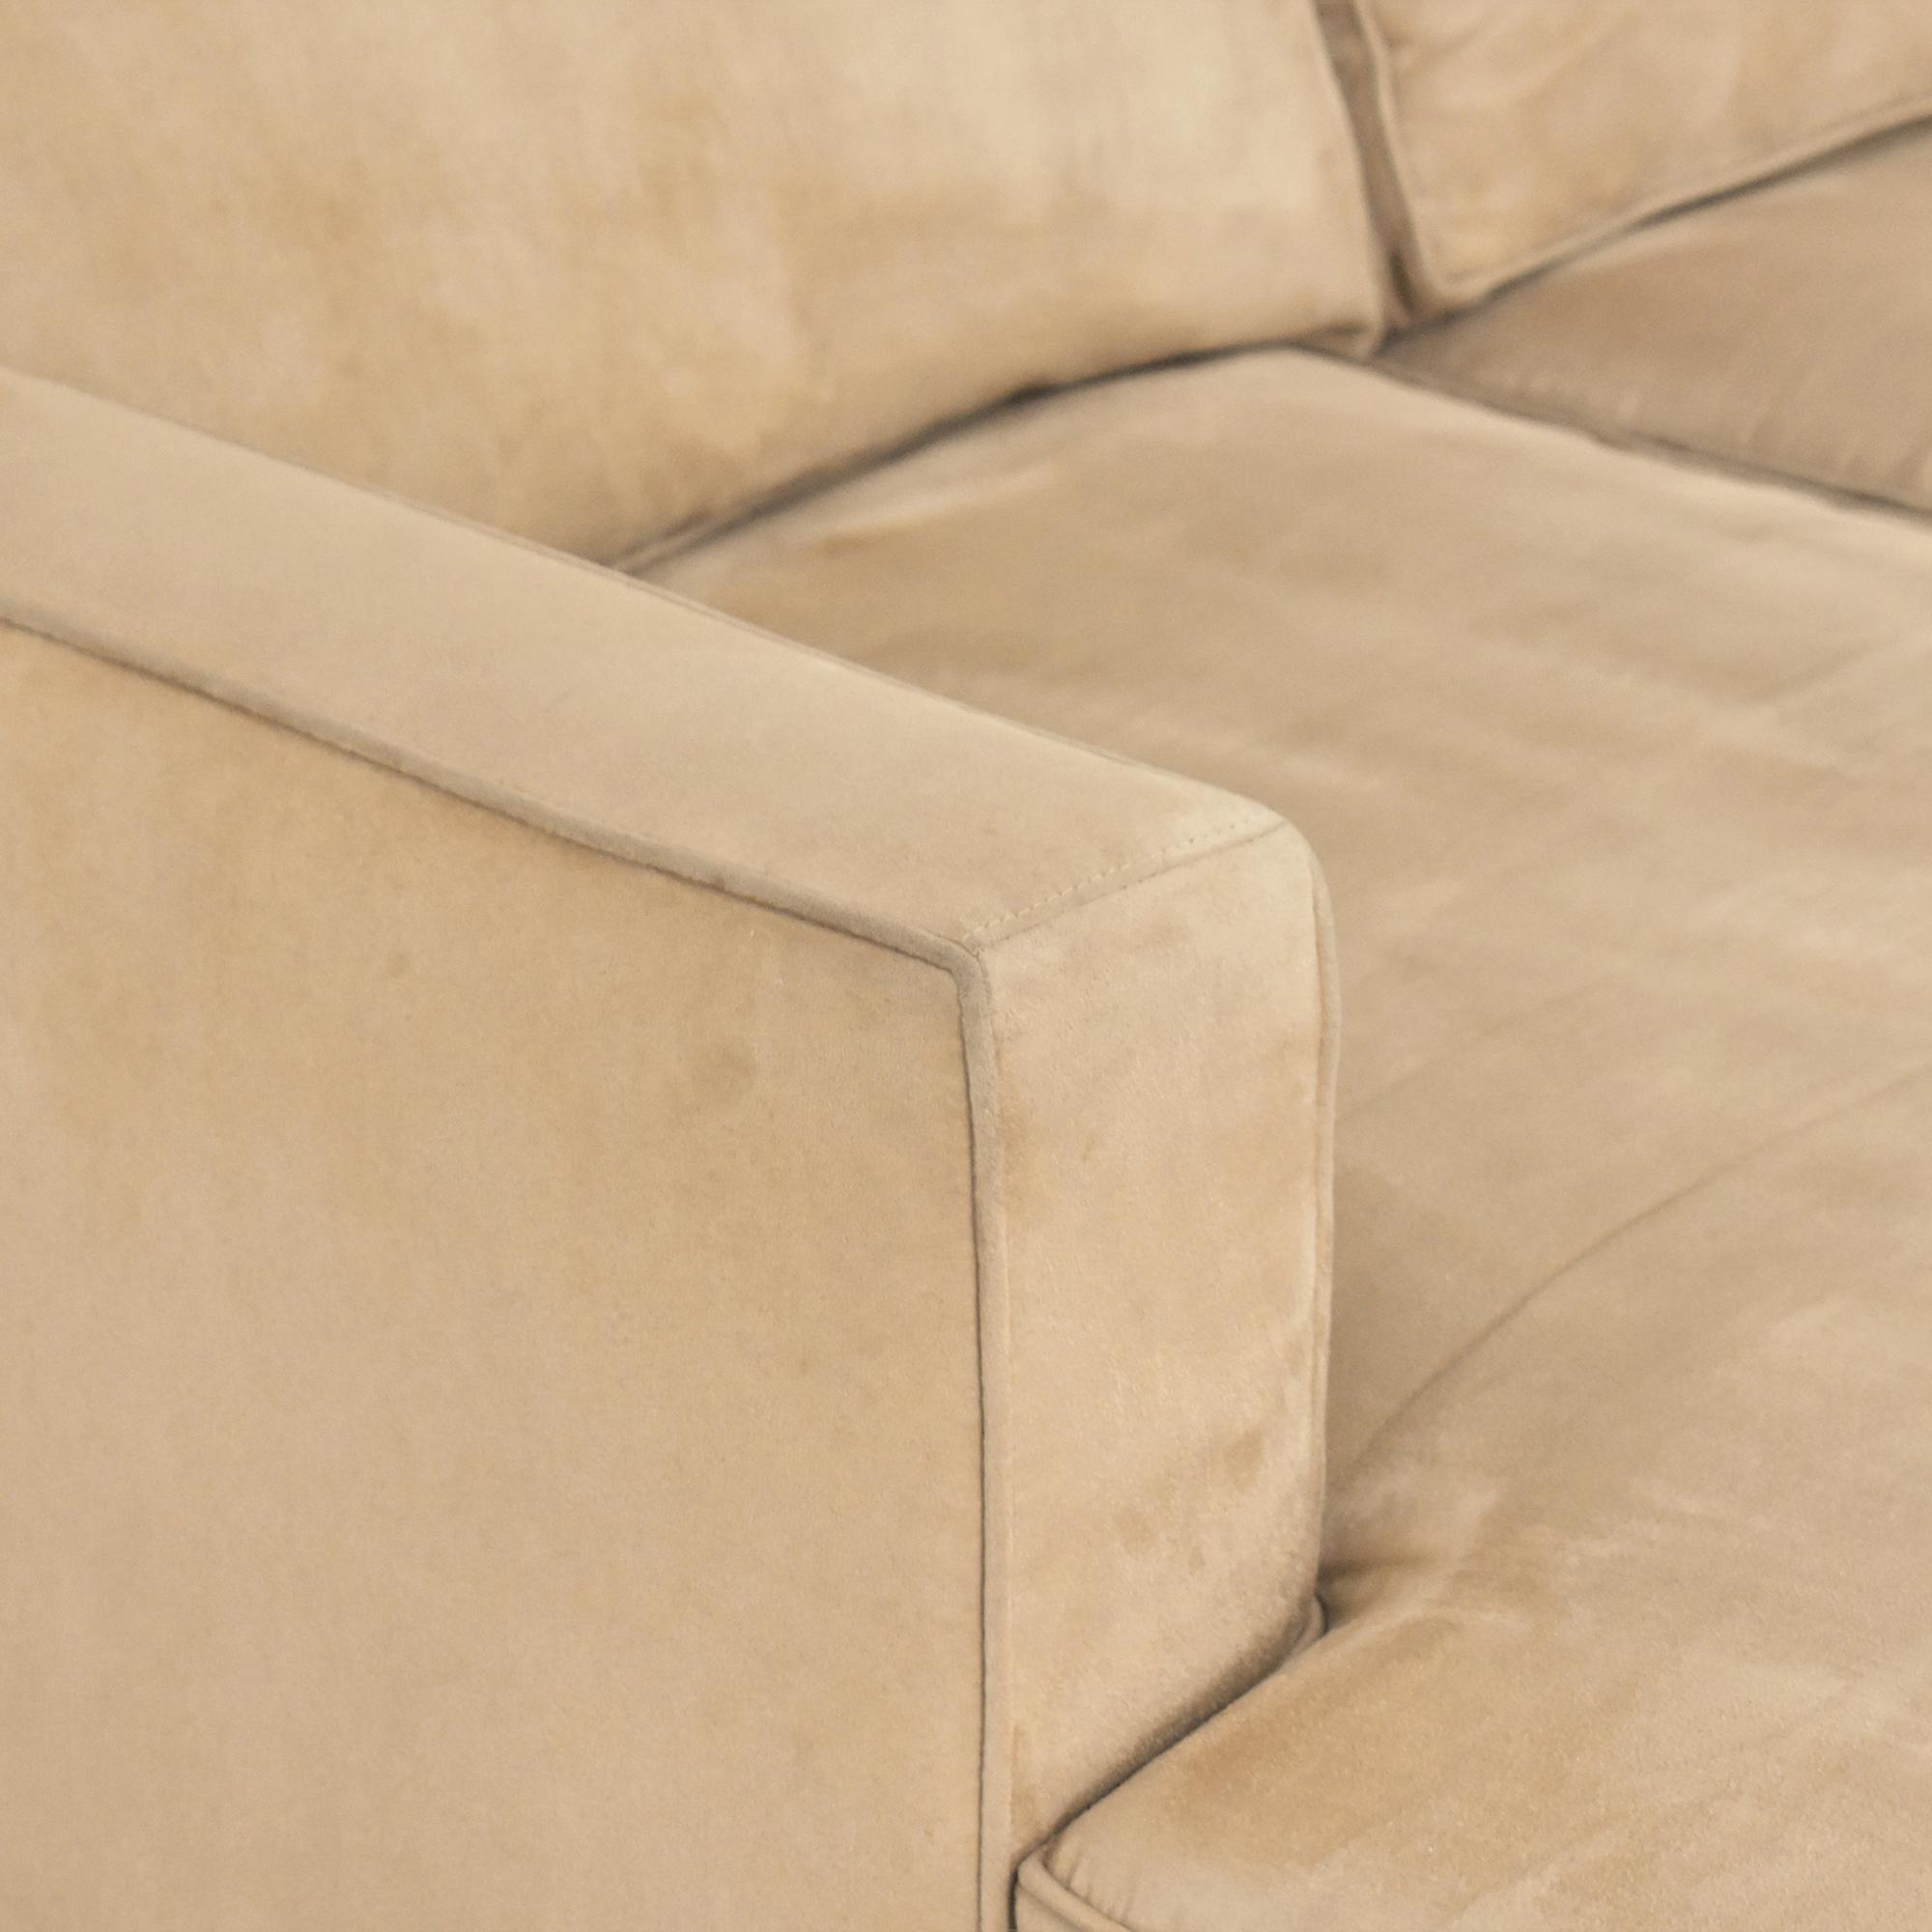 Crate & Barrel Crate & Barrel Barrett Chaise Sectional Sofa Sectionals